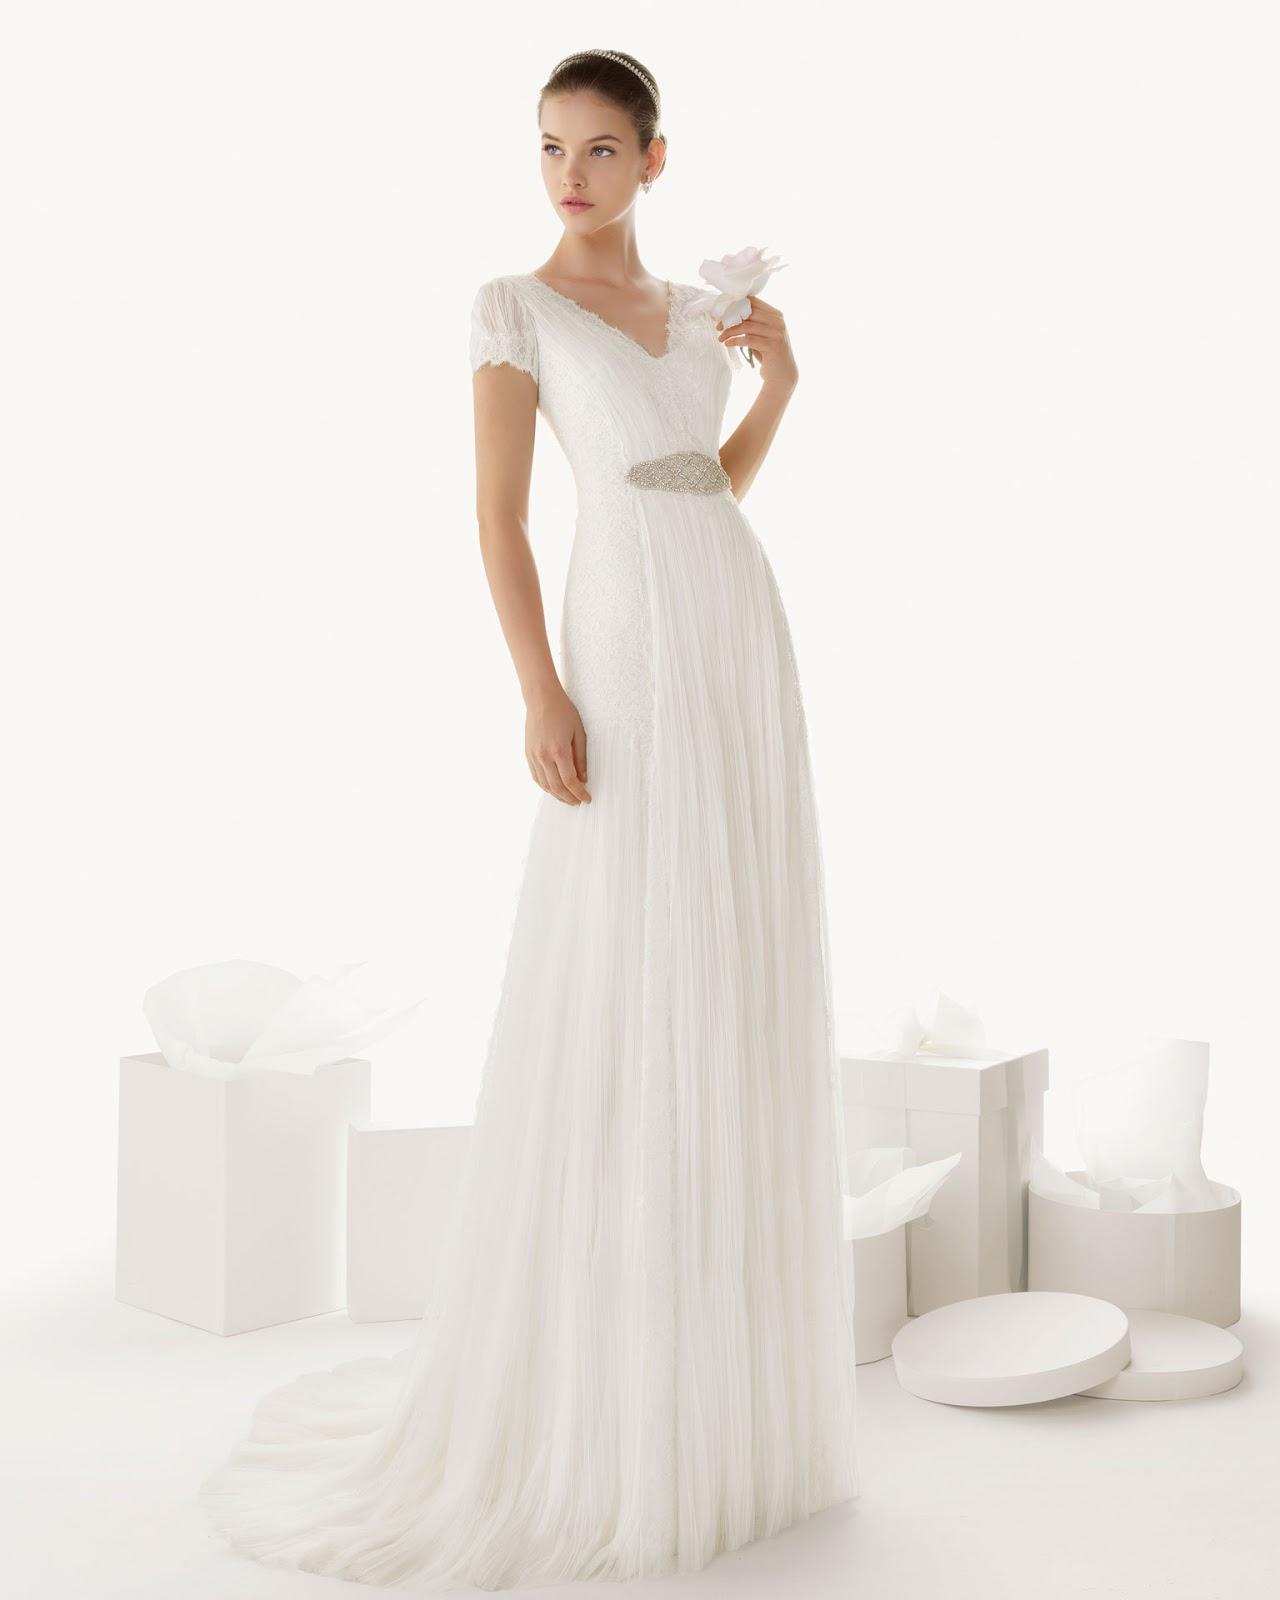 Cheap wedding gowns online blog spring 2013 wedding for Wedding dress rosa clara